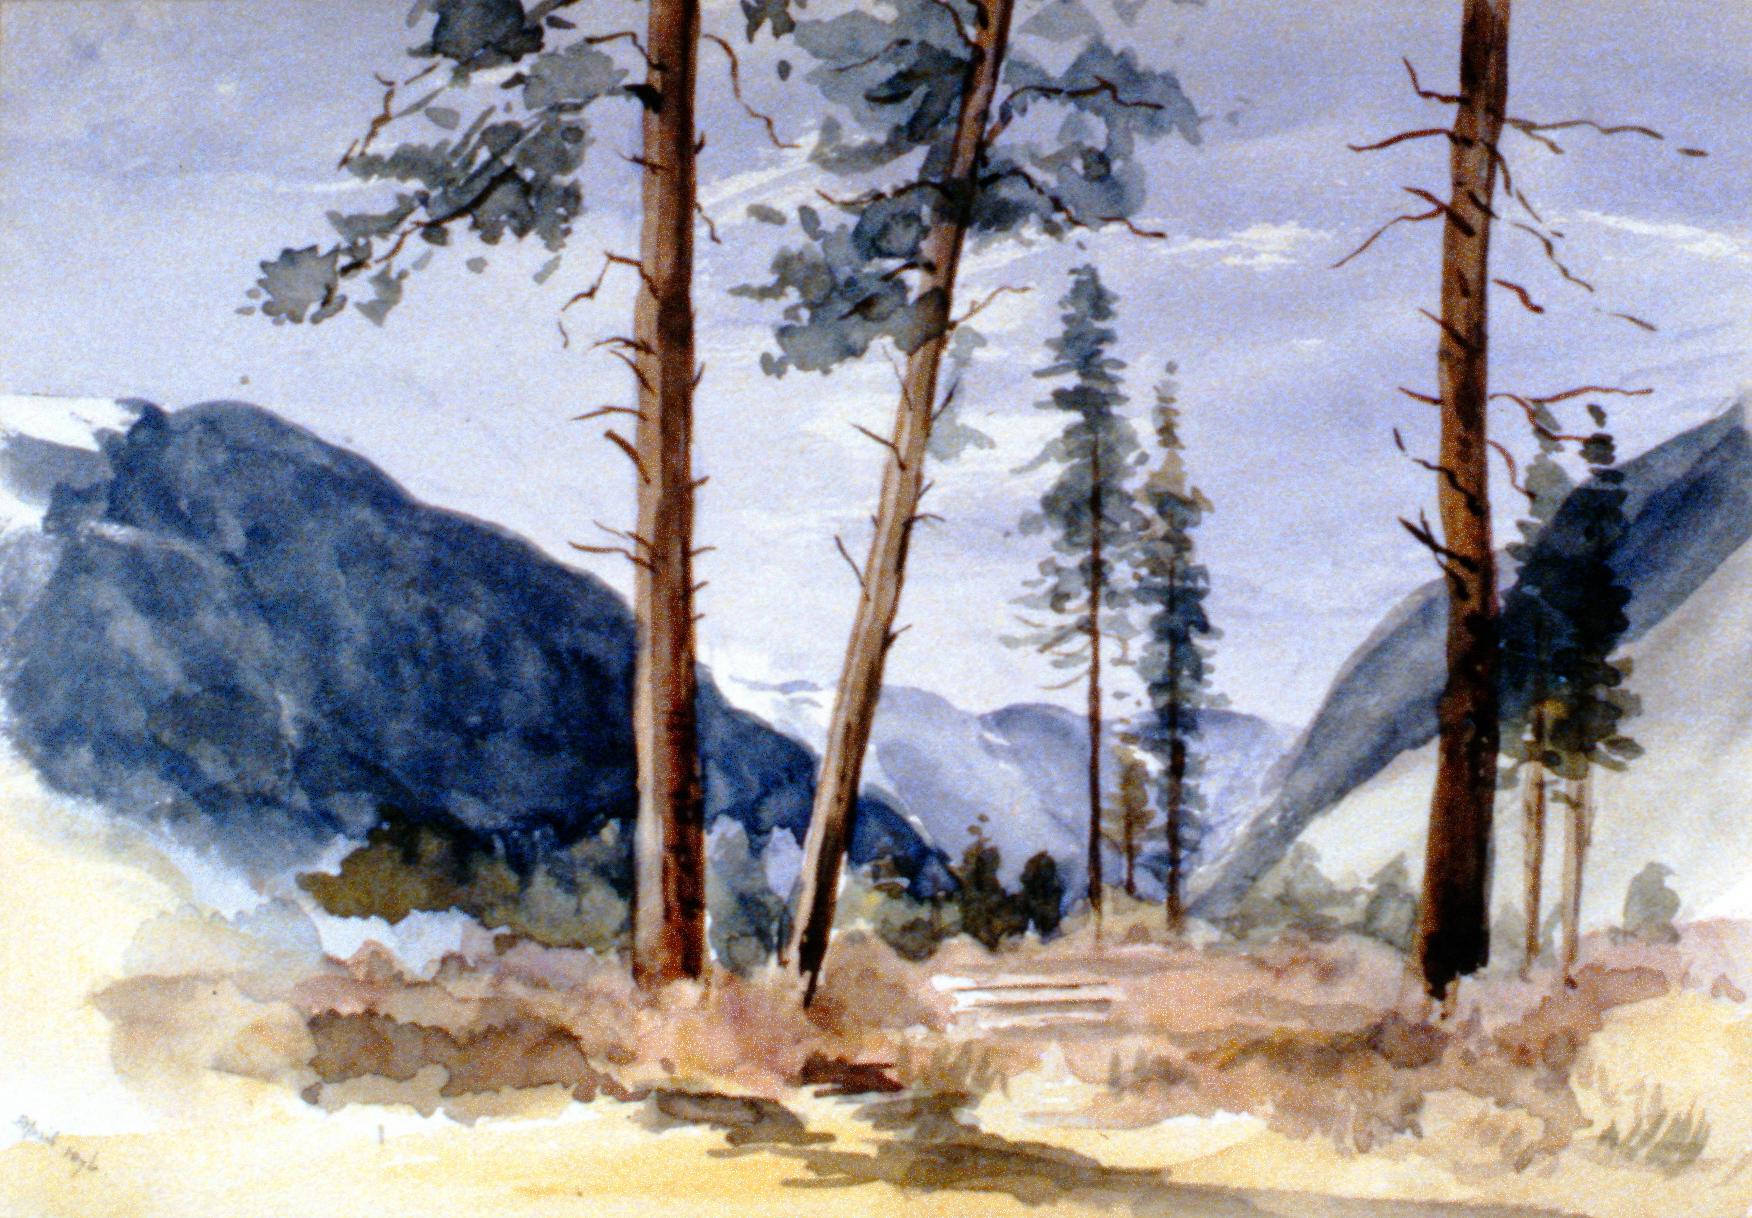 Untitled (Three Trees in Hedley), 1896, Julia Bullock-Webster,watercolour on paper, 22.5 x 32.5 cm,1983.02.09. Gift of Mrs. Barbara Steel.